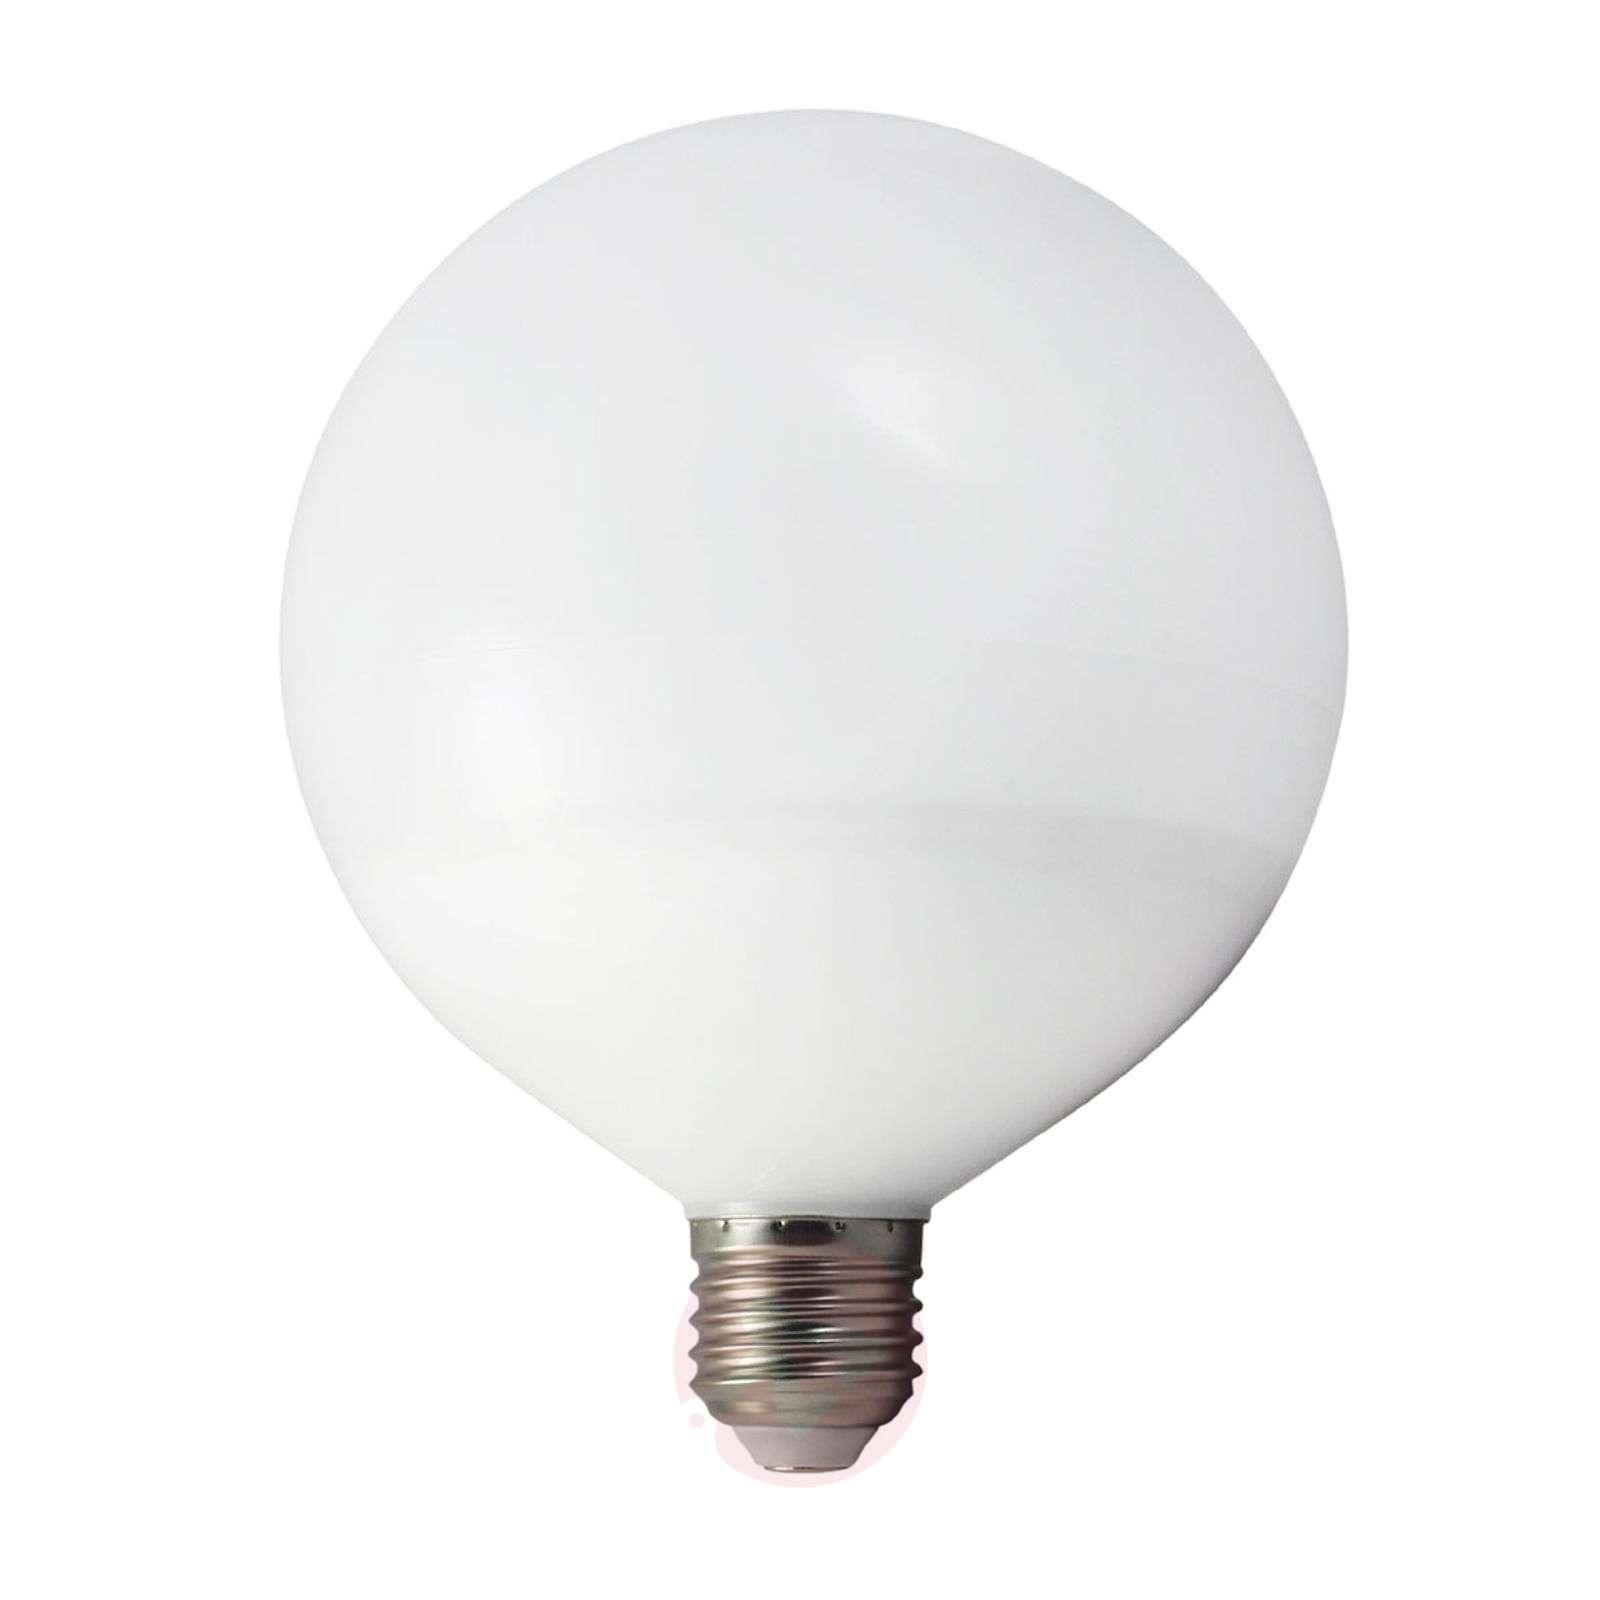 E27 15W 827 LED globe lamp, warm white-2515036-01